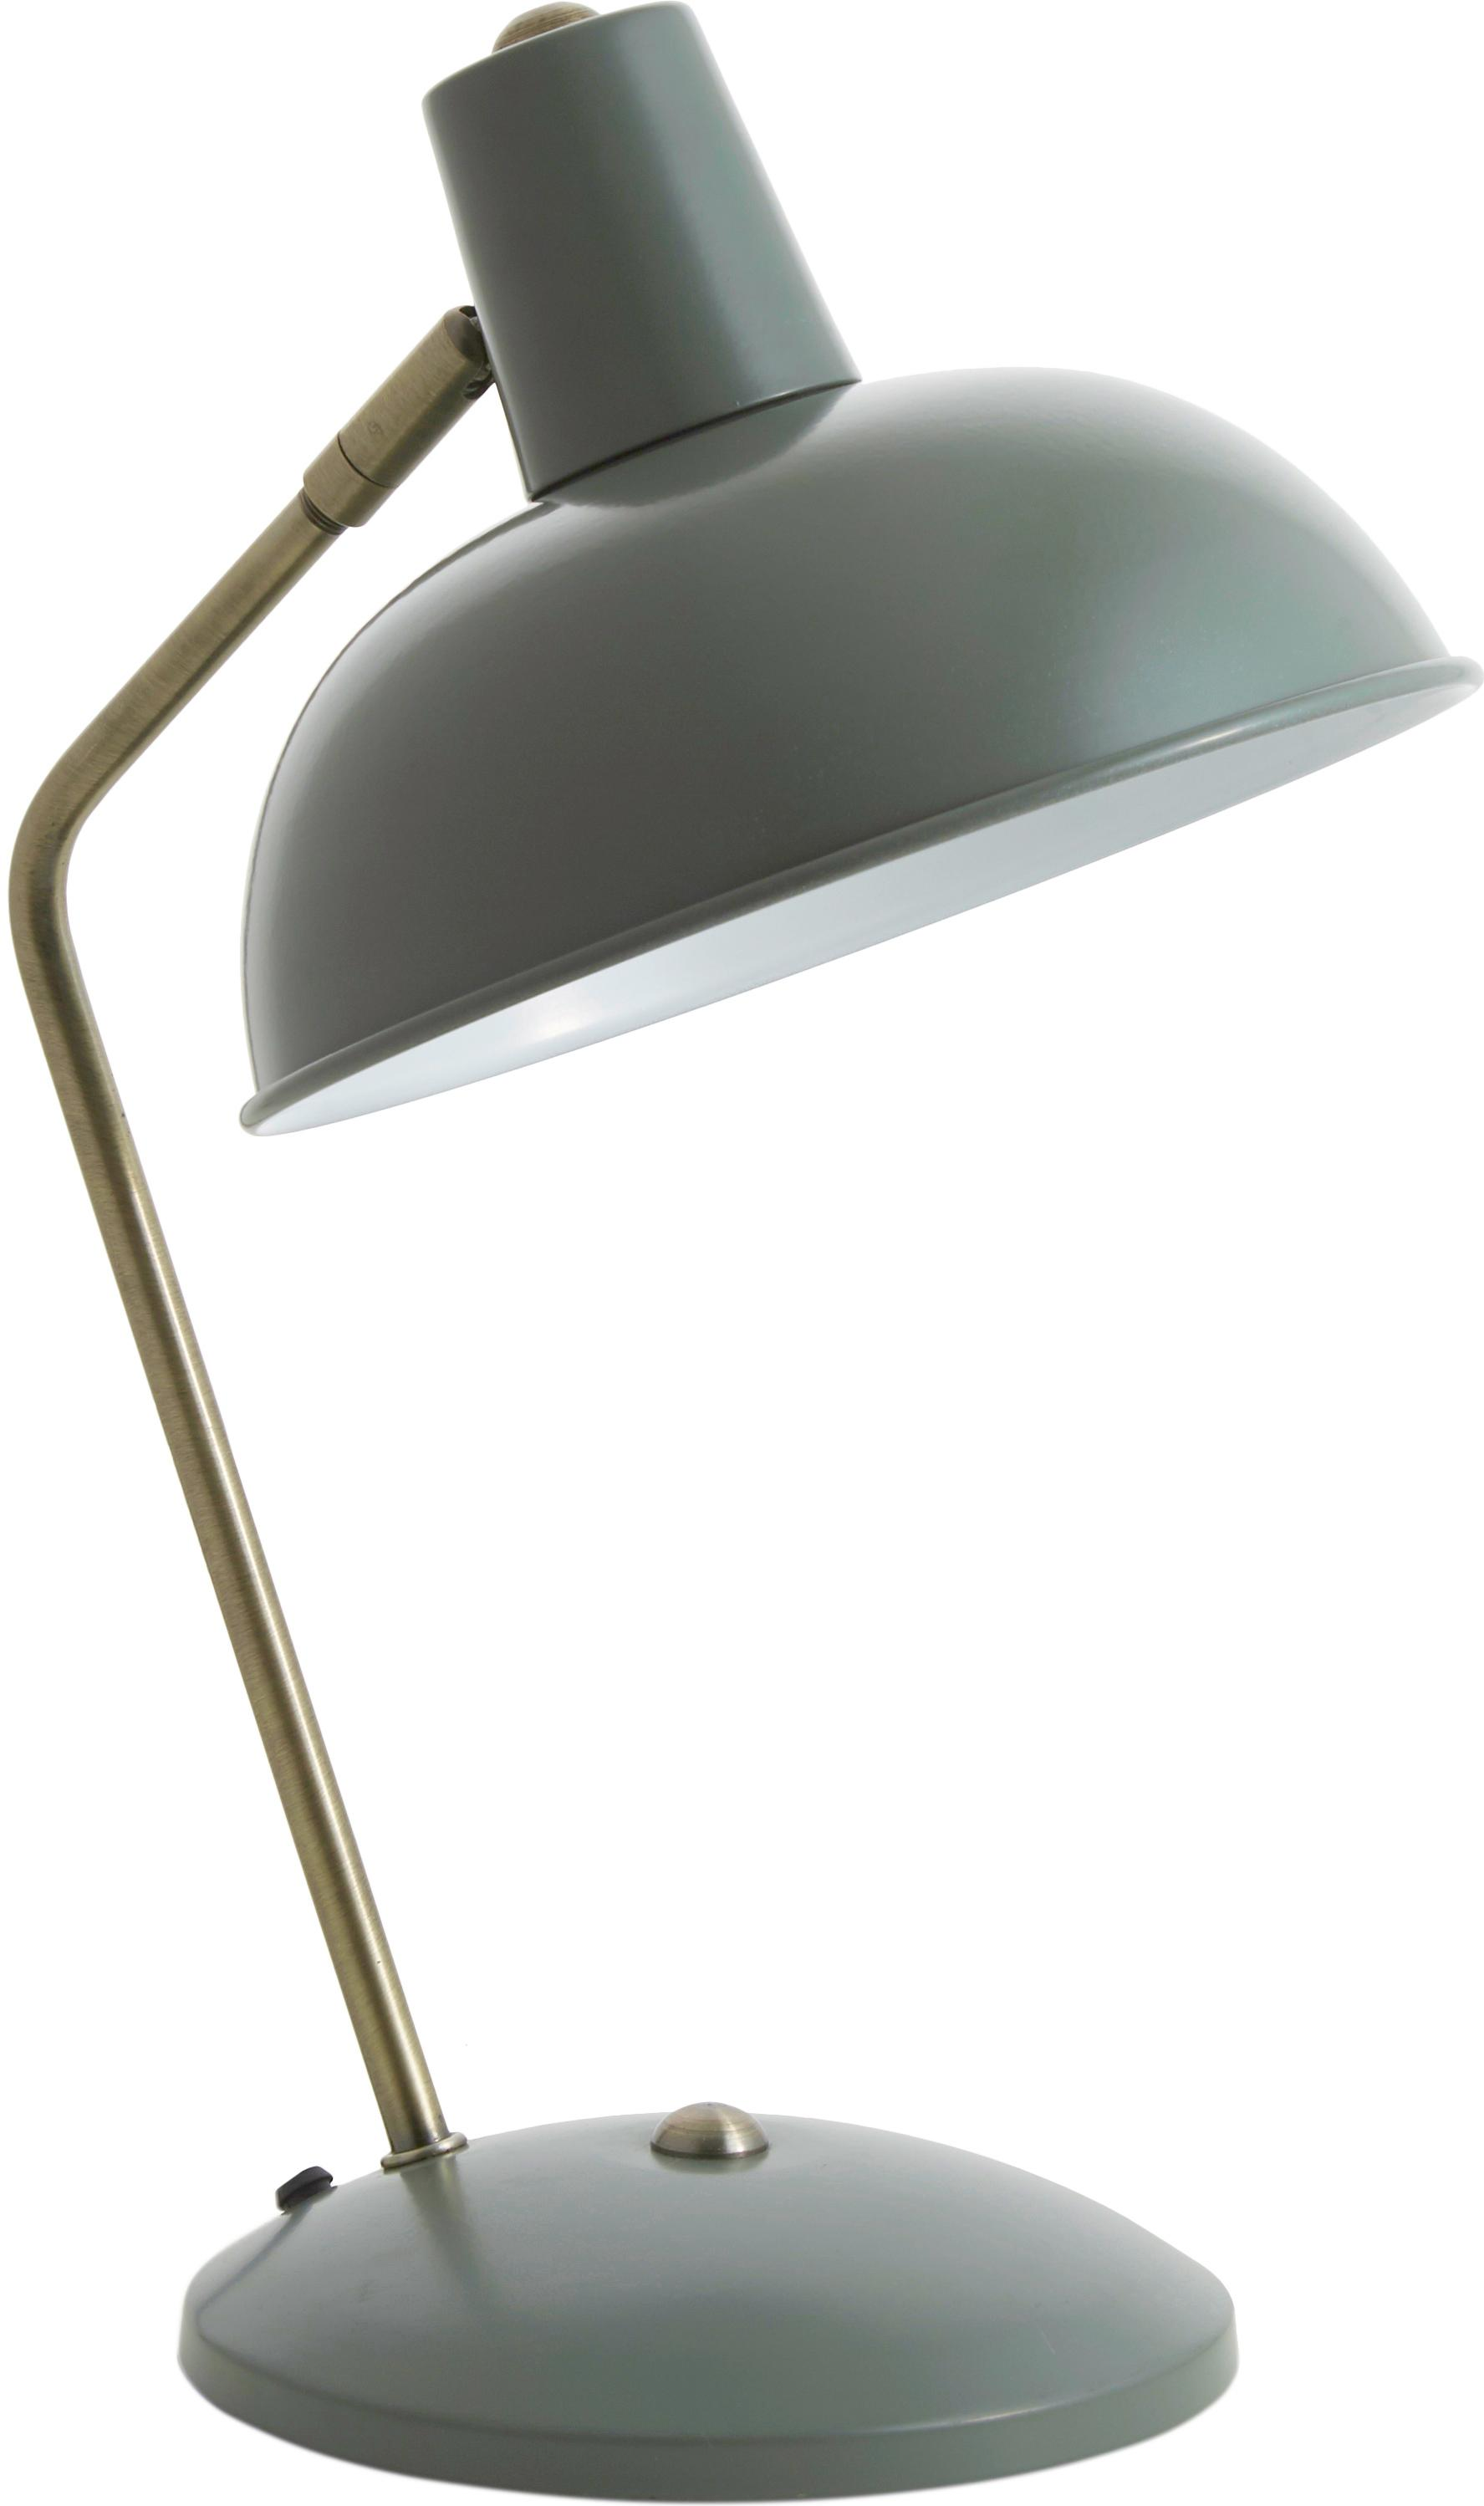 Retro-Schreibtischlampe Hood, Lampenschirm: Metall, lackiert, Lampenfuß: Metall, lackiert, Leuchte: Grün, Messingfarben<br>Lampenschirm innen: Weiß, 20 x 38 cm